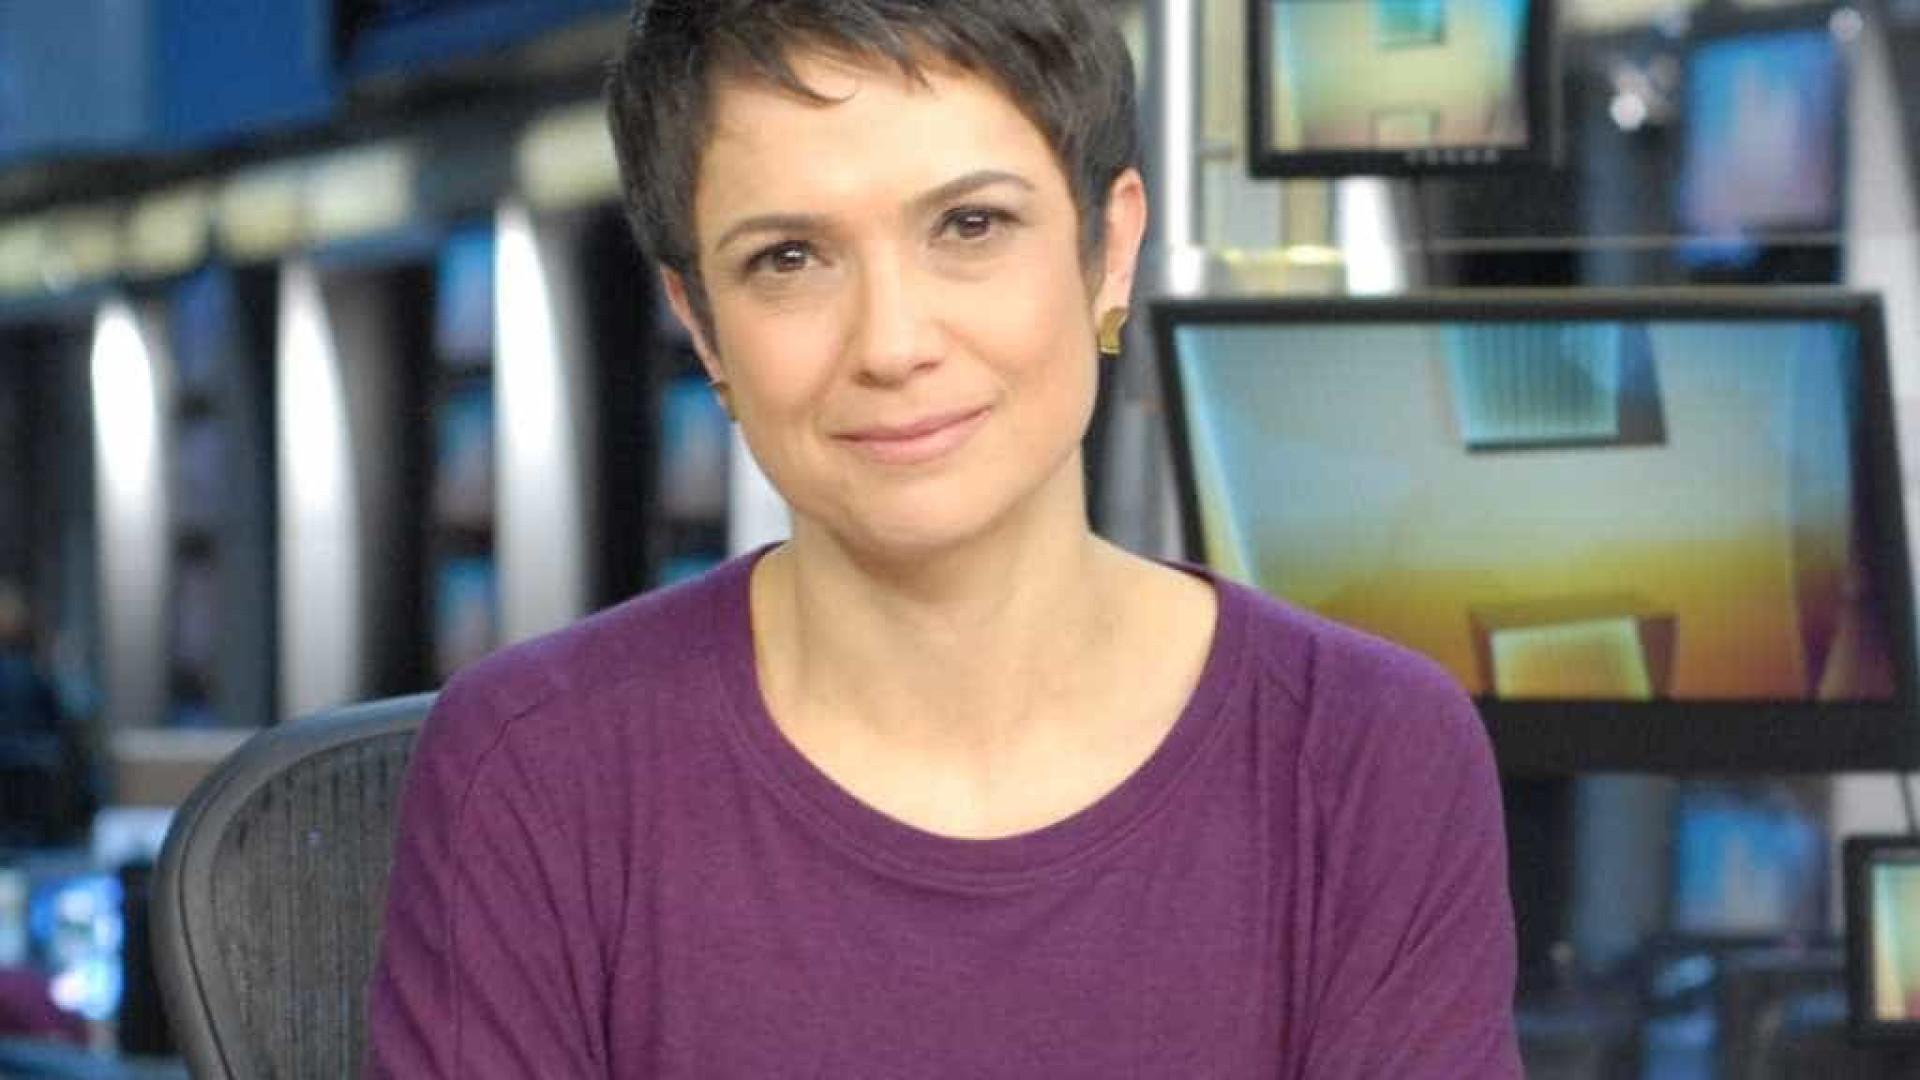 Sandra Annenbergse declara a Jô Soares durante jornal: 'Eu te amo'